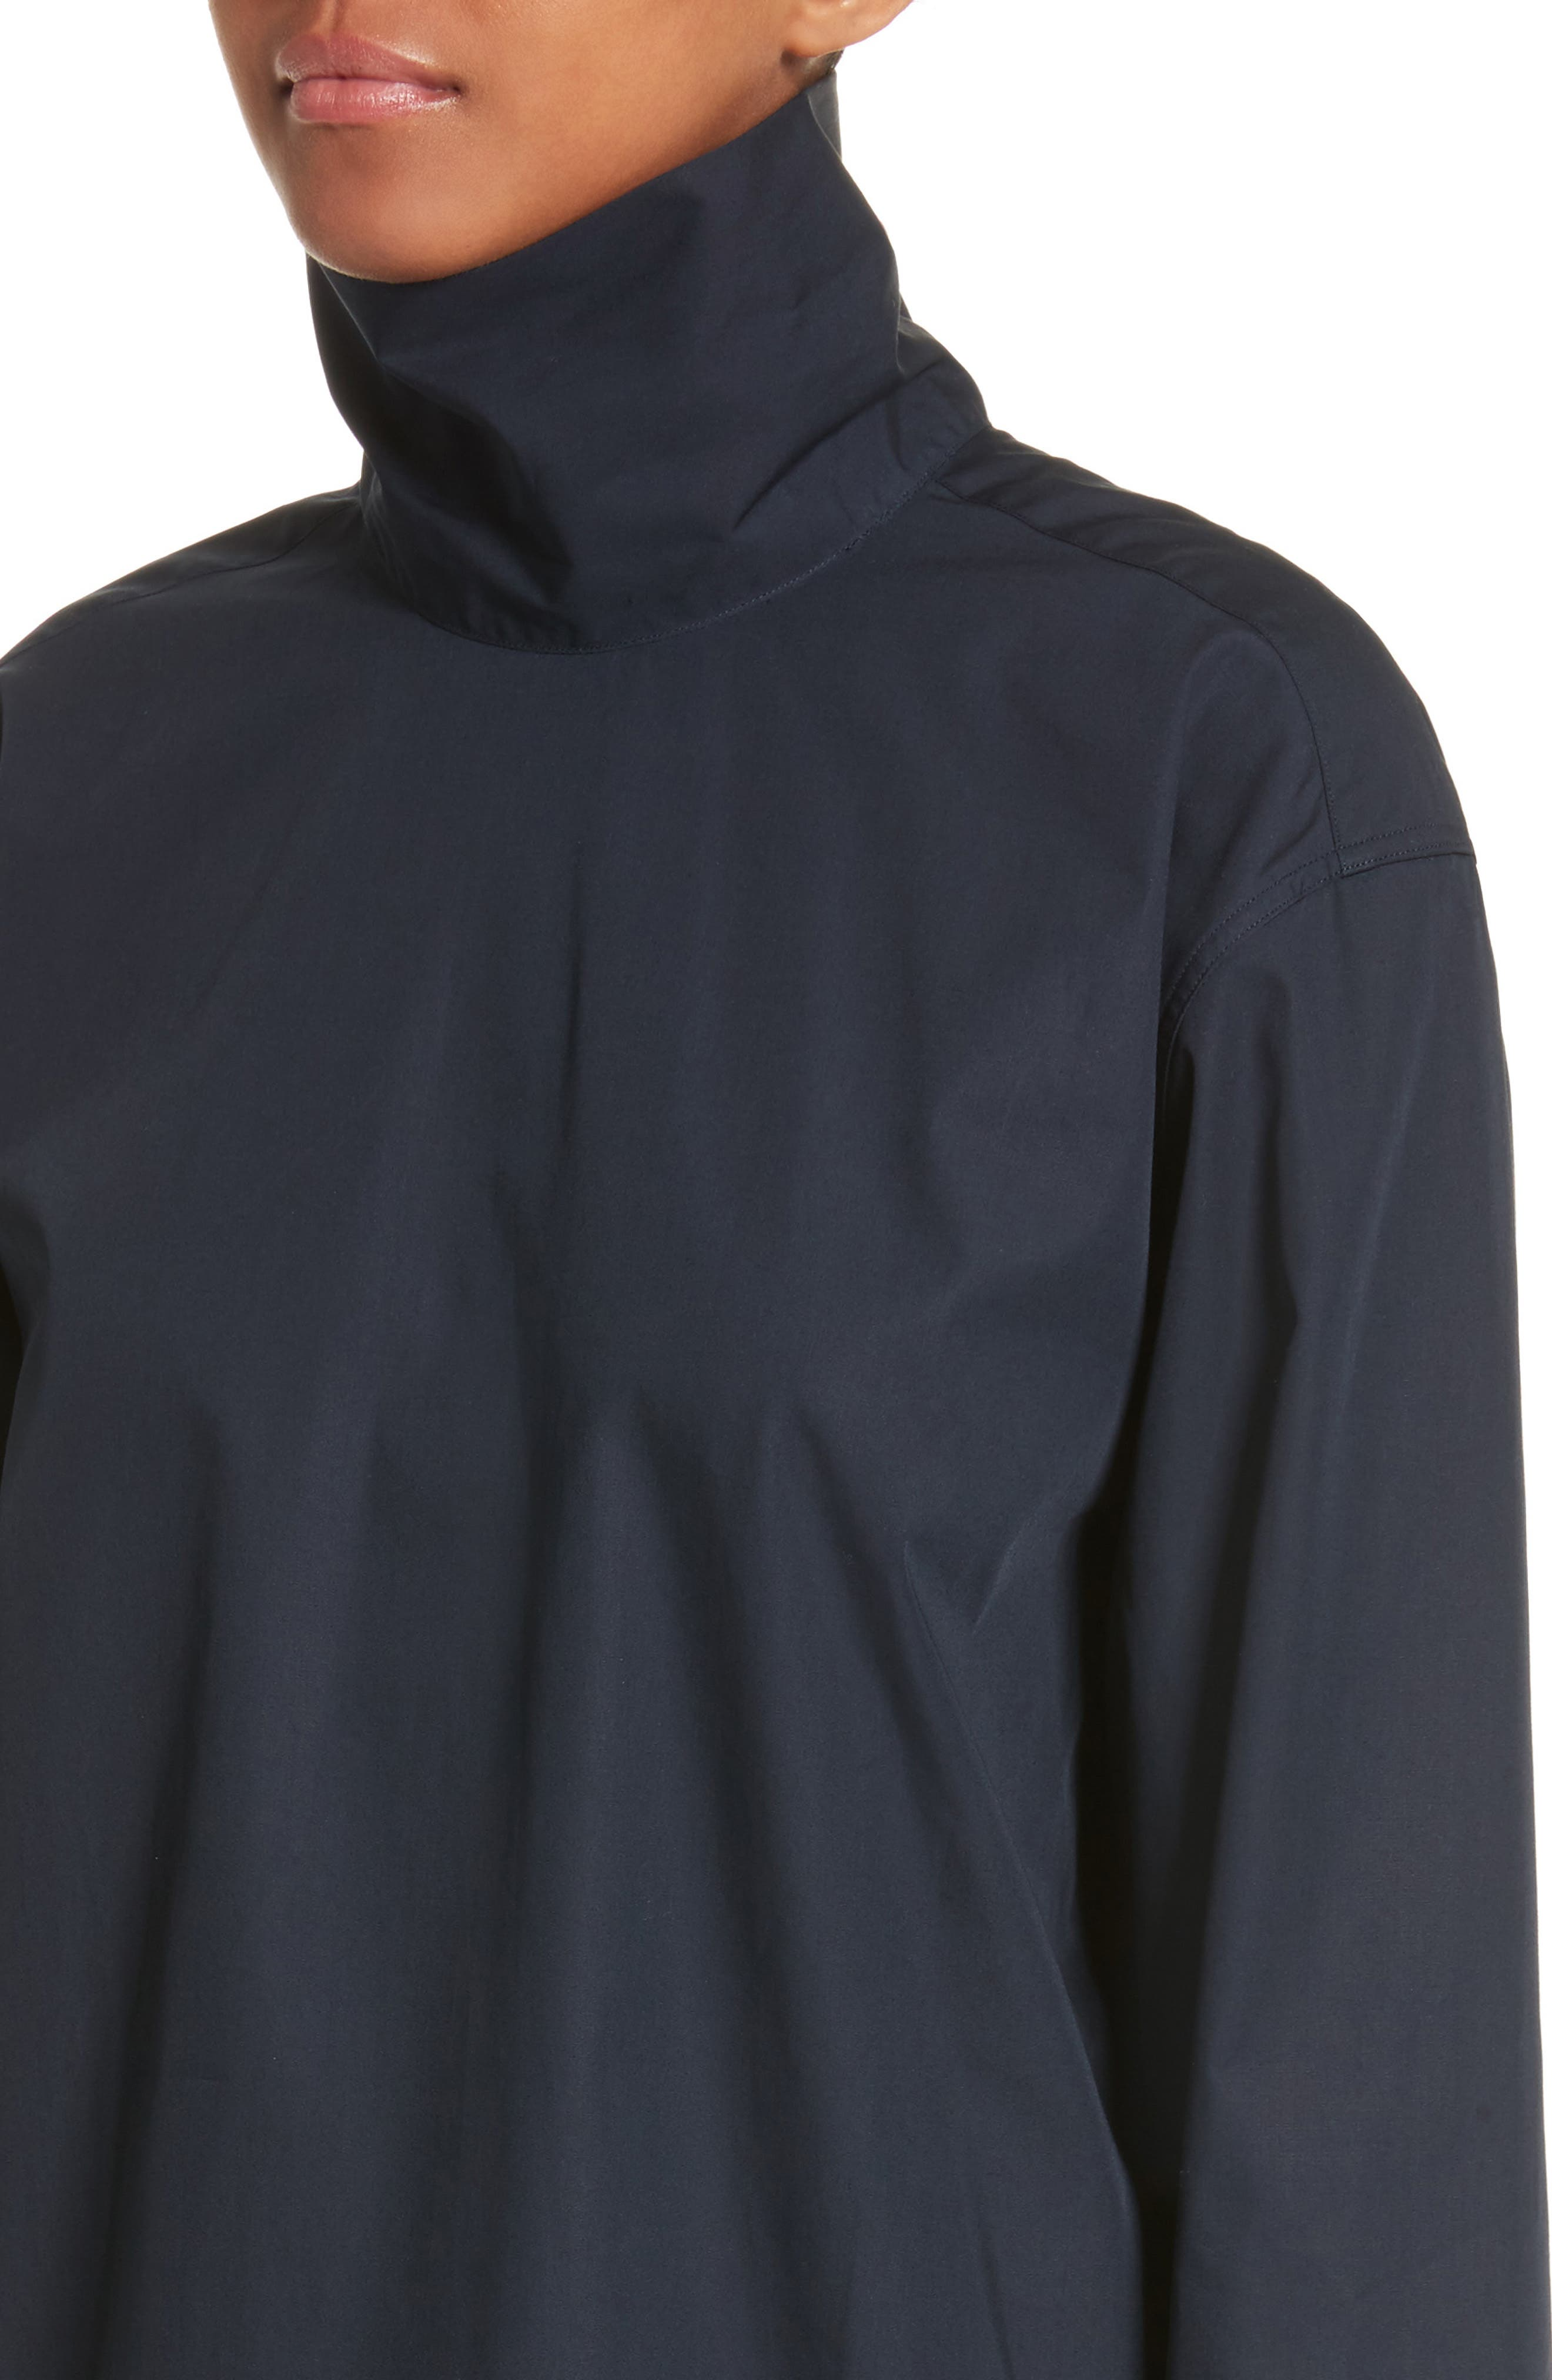 Alternate Image 4  - Dries Van Noten Cotton Poplin Mock Neck Shirt